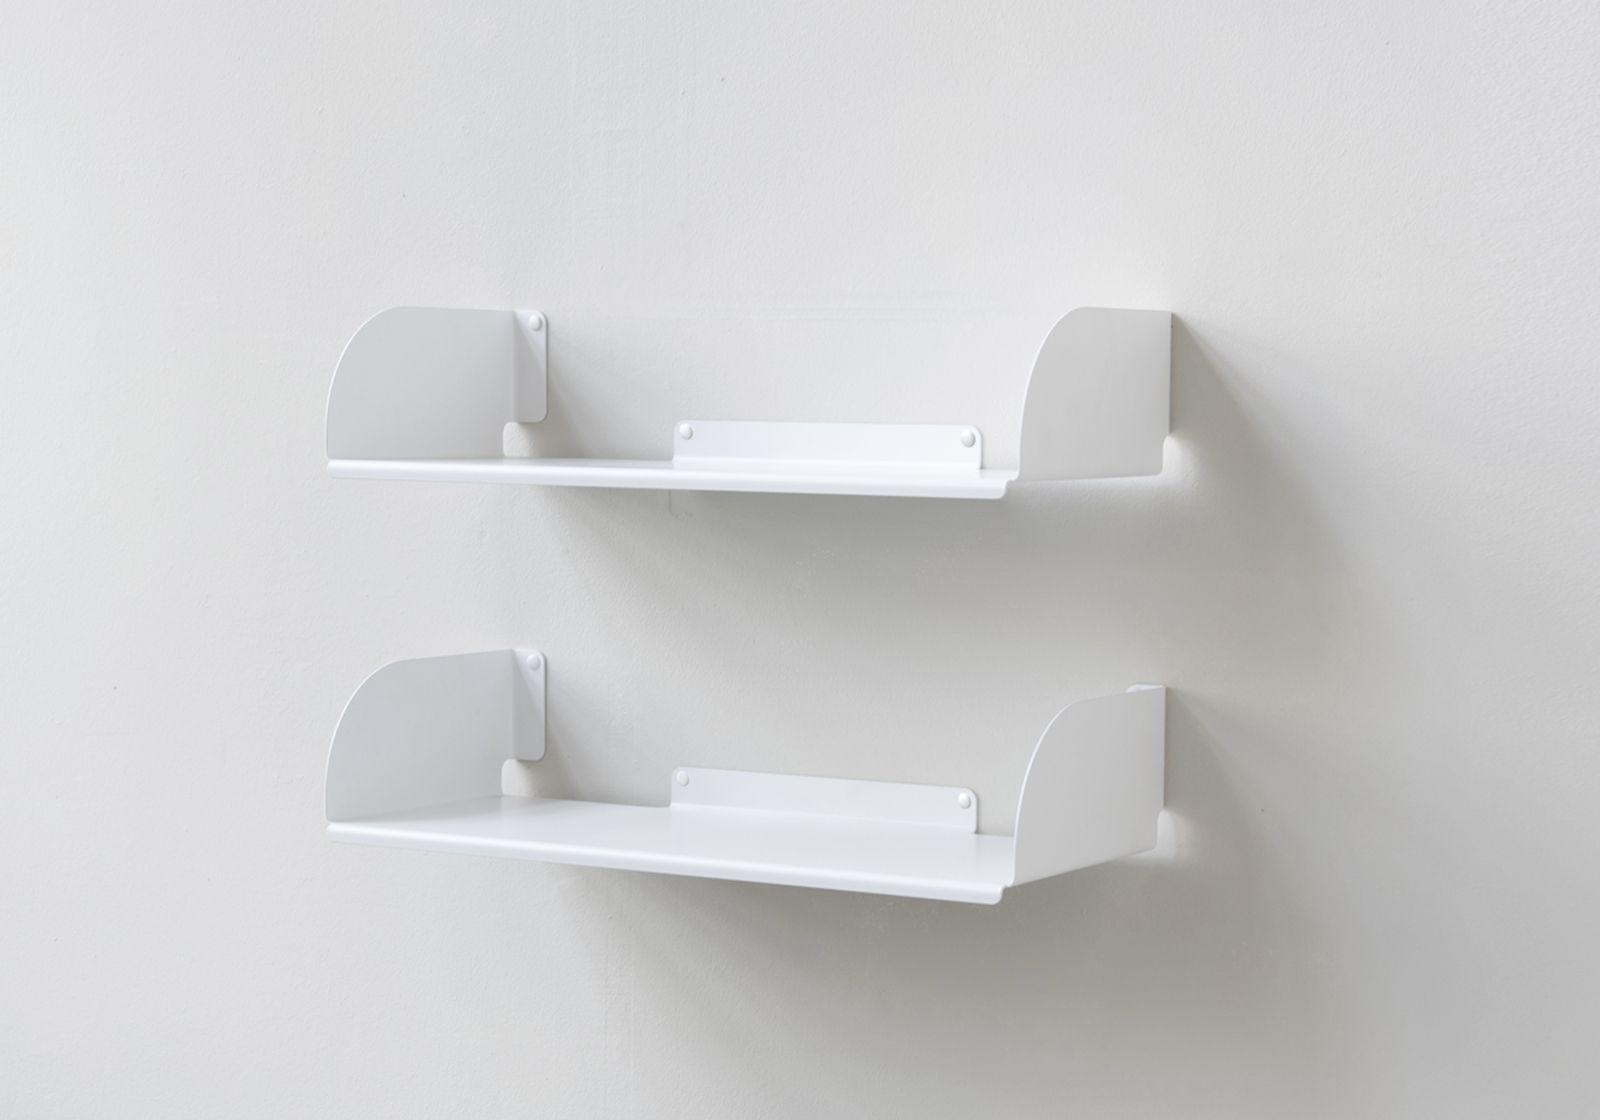 Wall Bookshelves Ubd 23 Inch Set Of 2